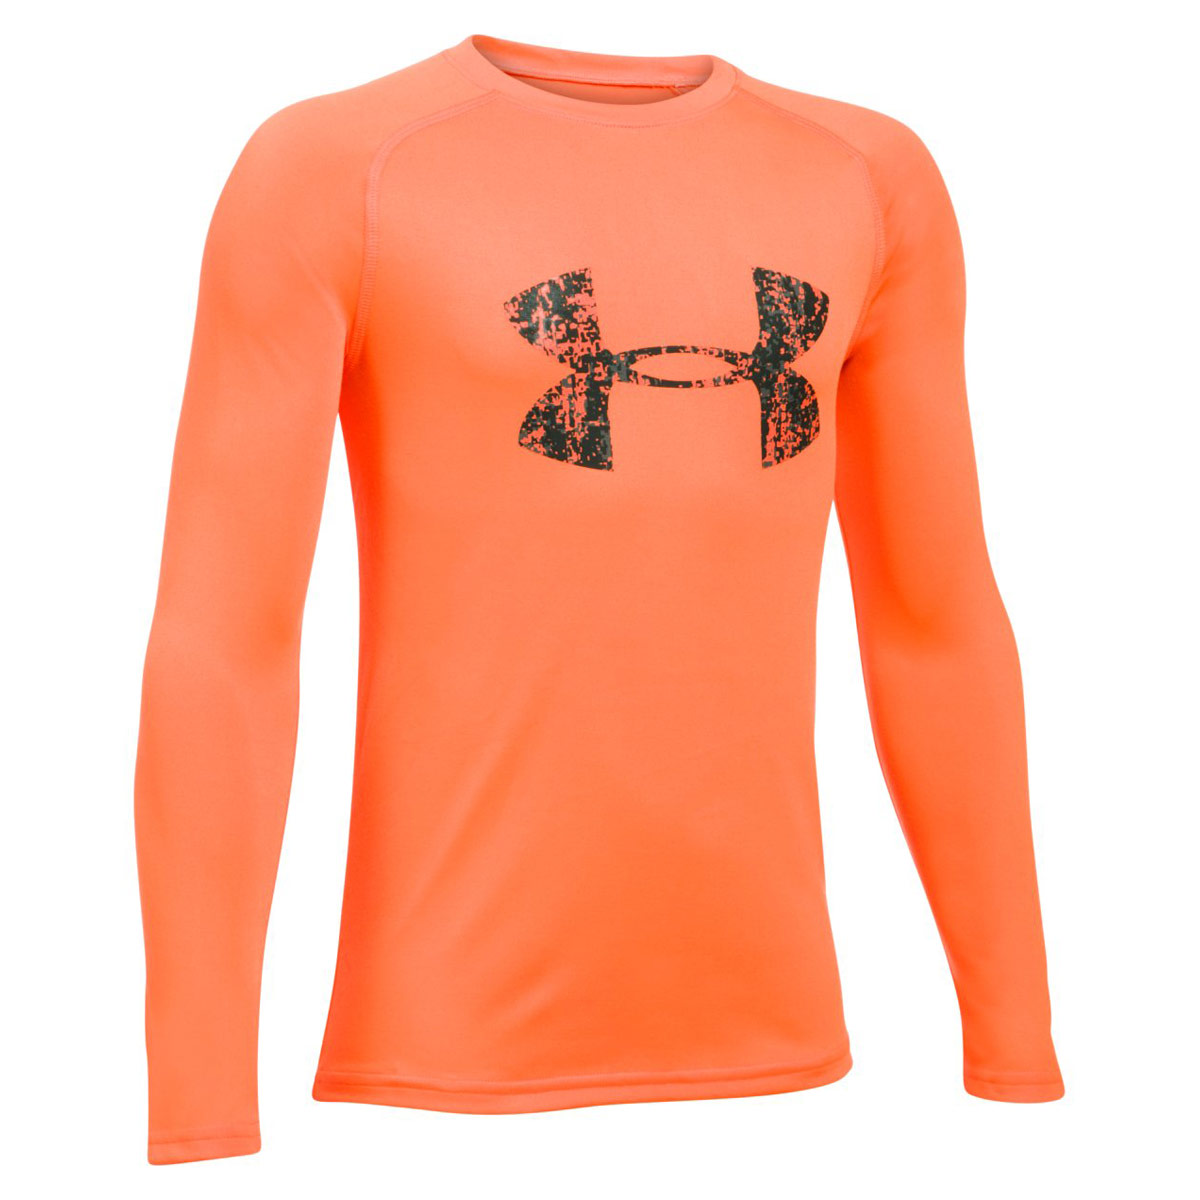 fbea819c Under Armour Big Logo Long Sleeve Tee - Fitness tops - Orange